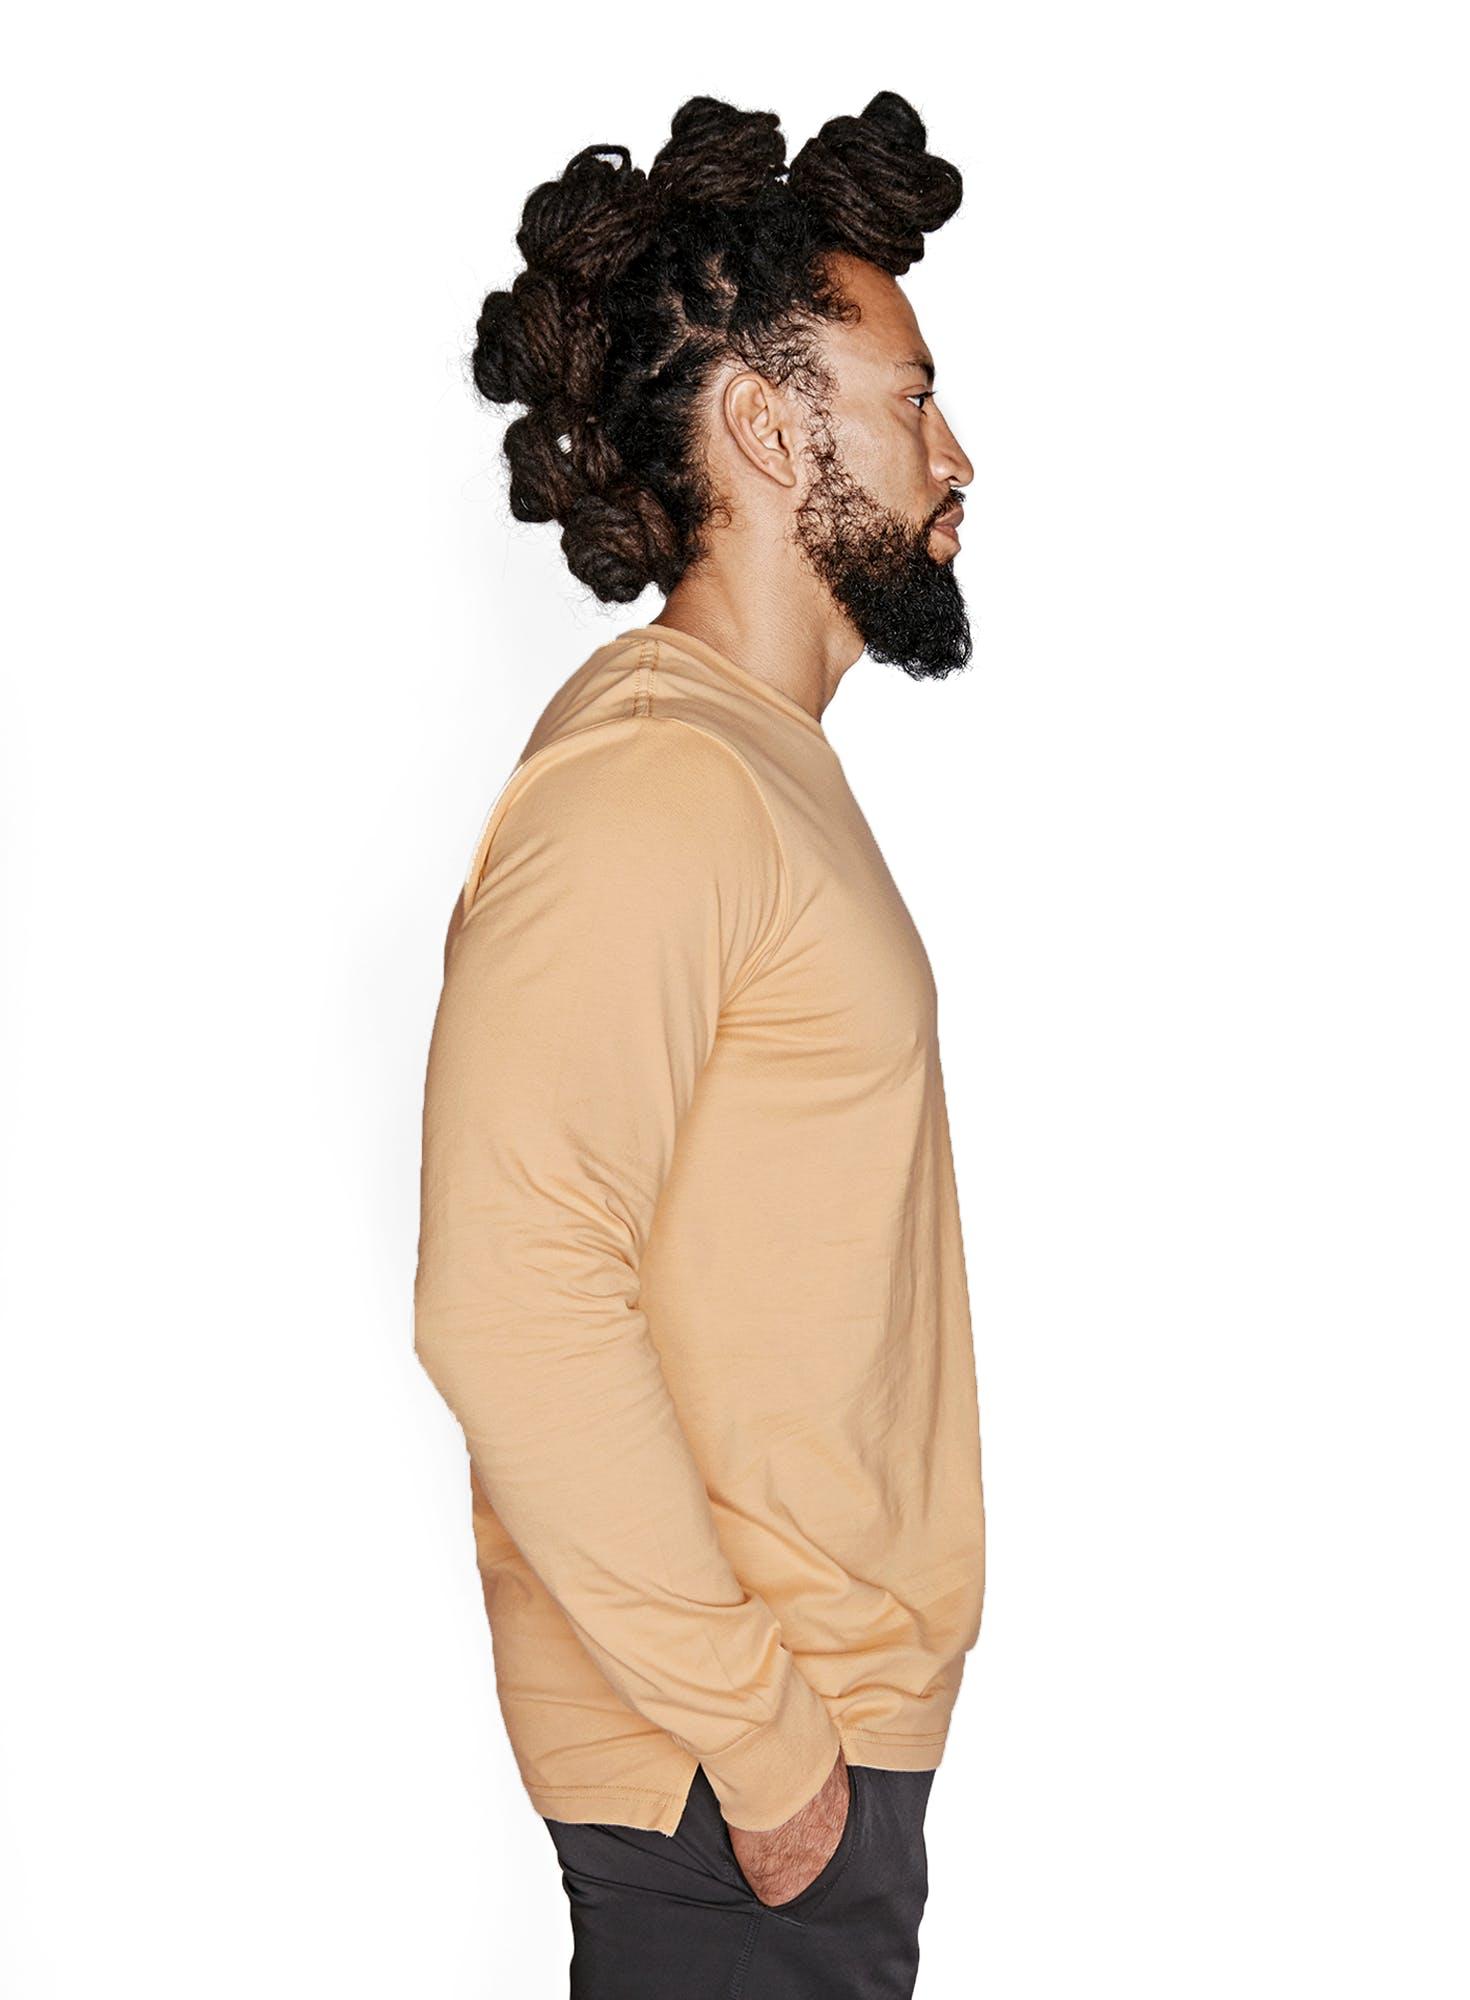 Pennant Long Sleeve T-Shirt Bonus Image